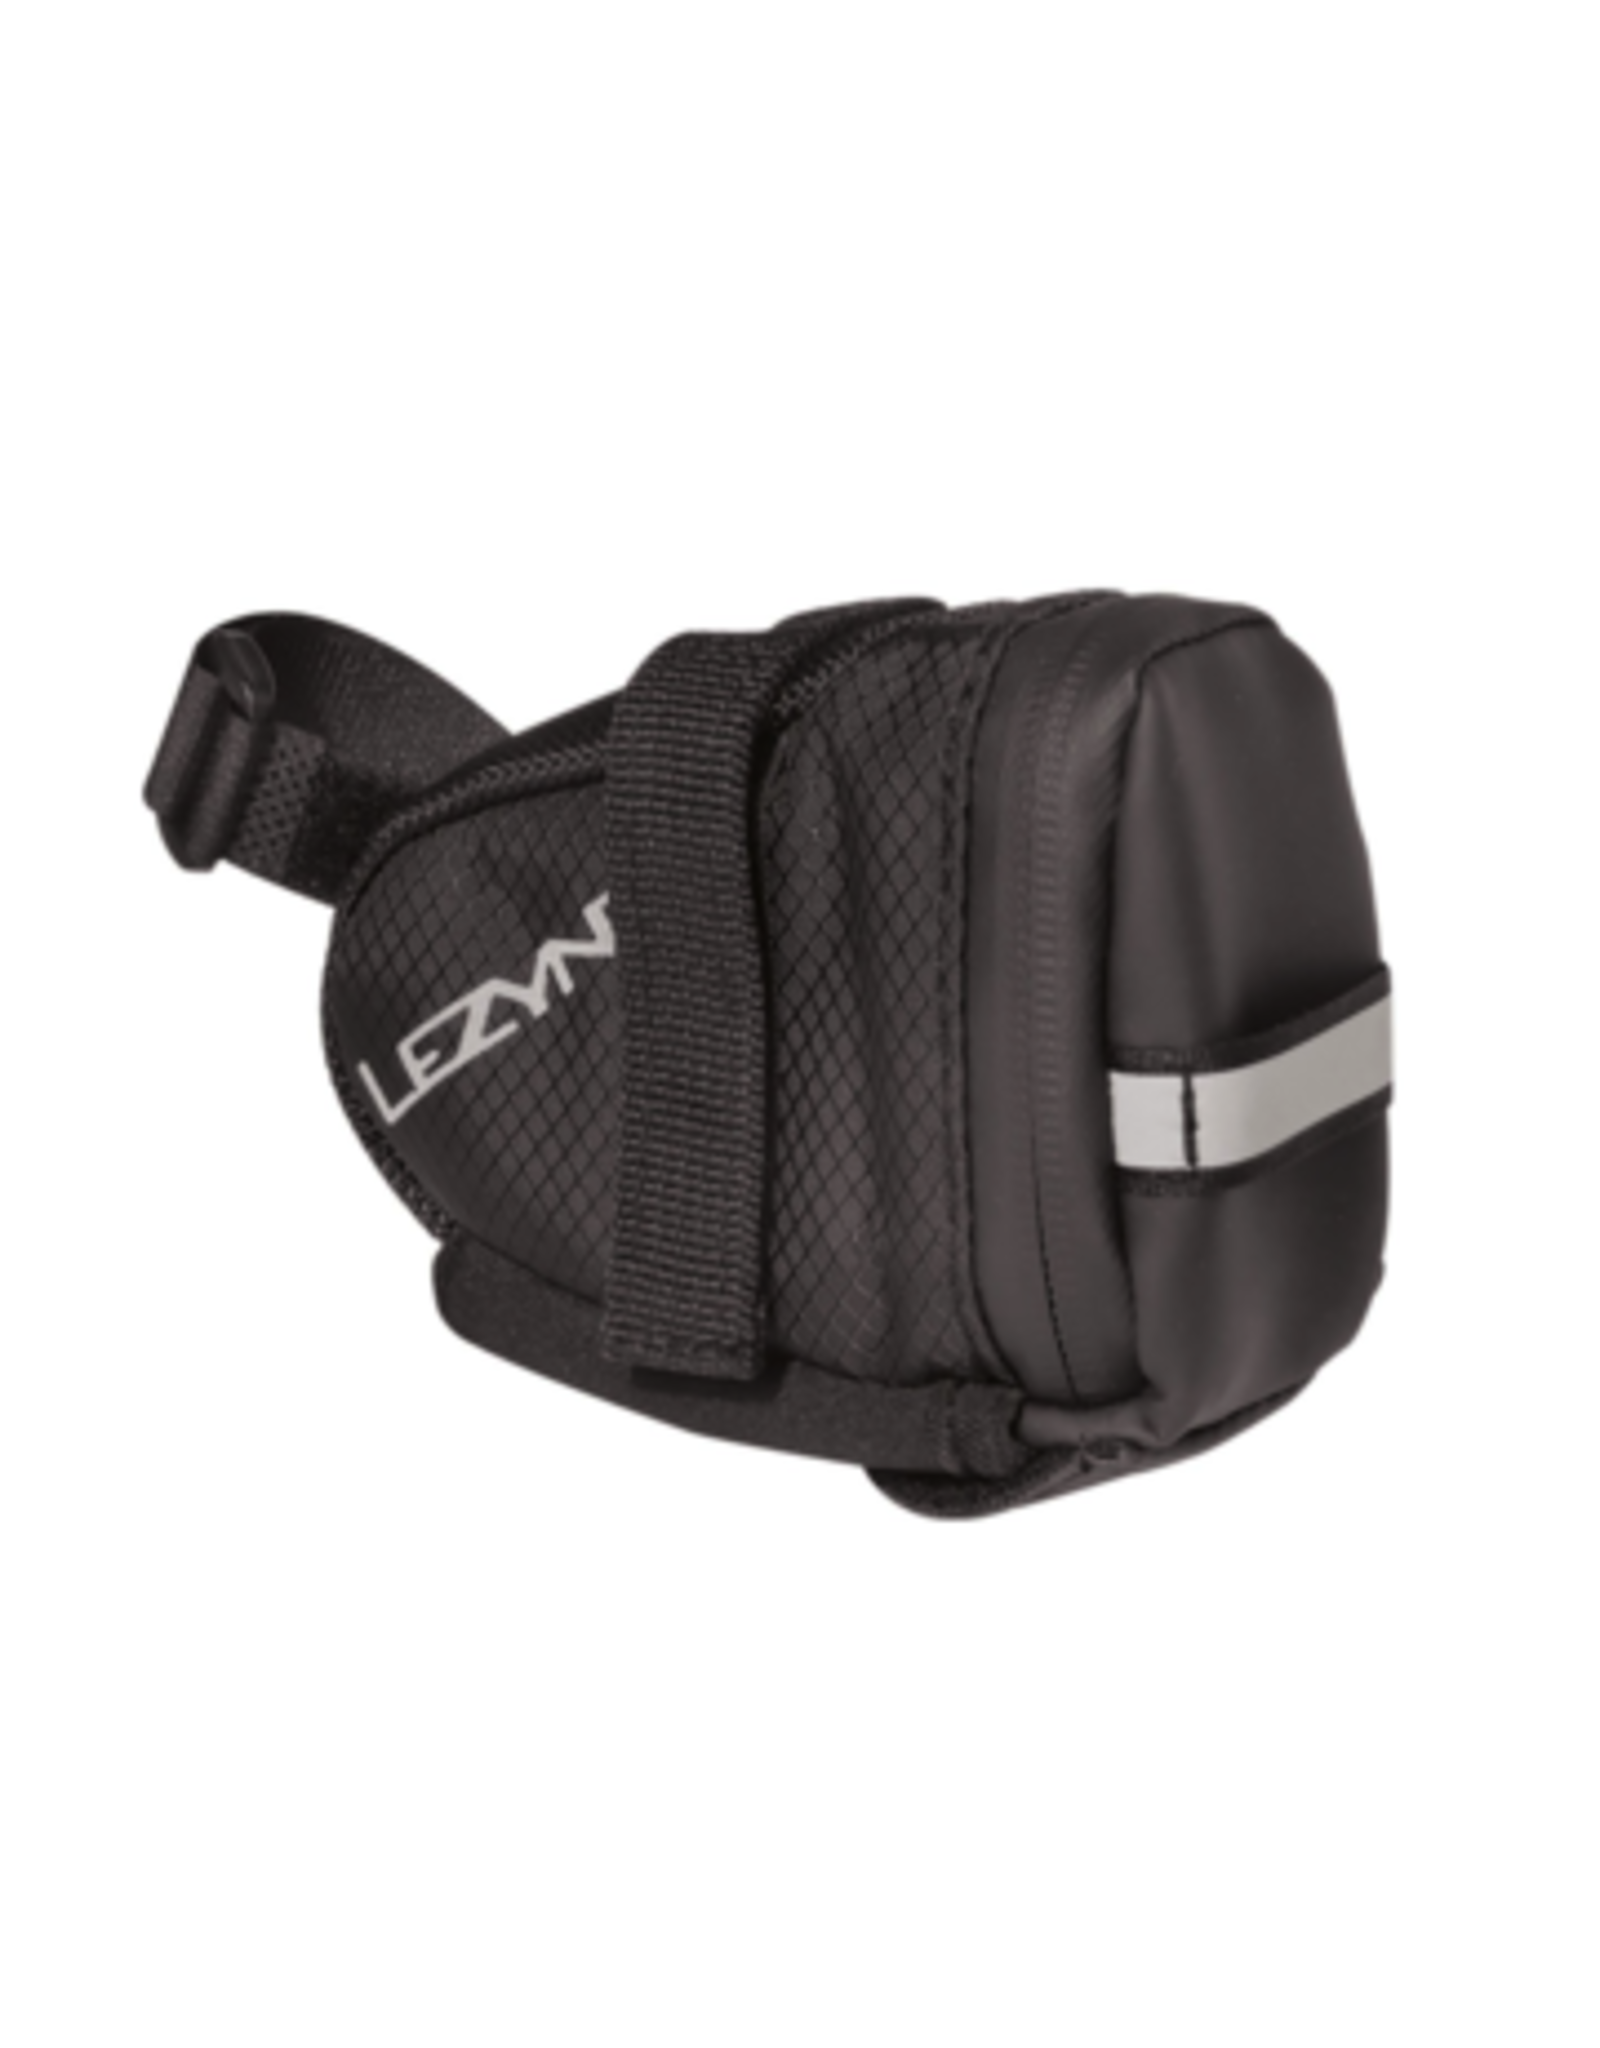 Lezyne, S-Caddy, Saddle bag, Black/Black